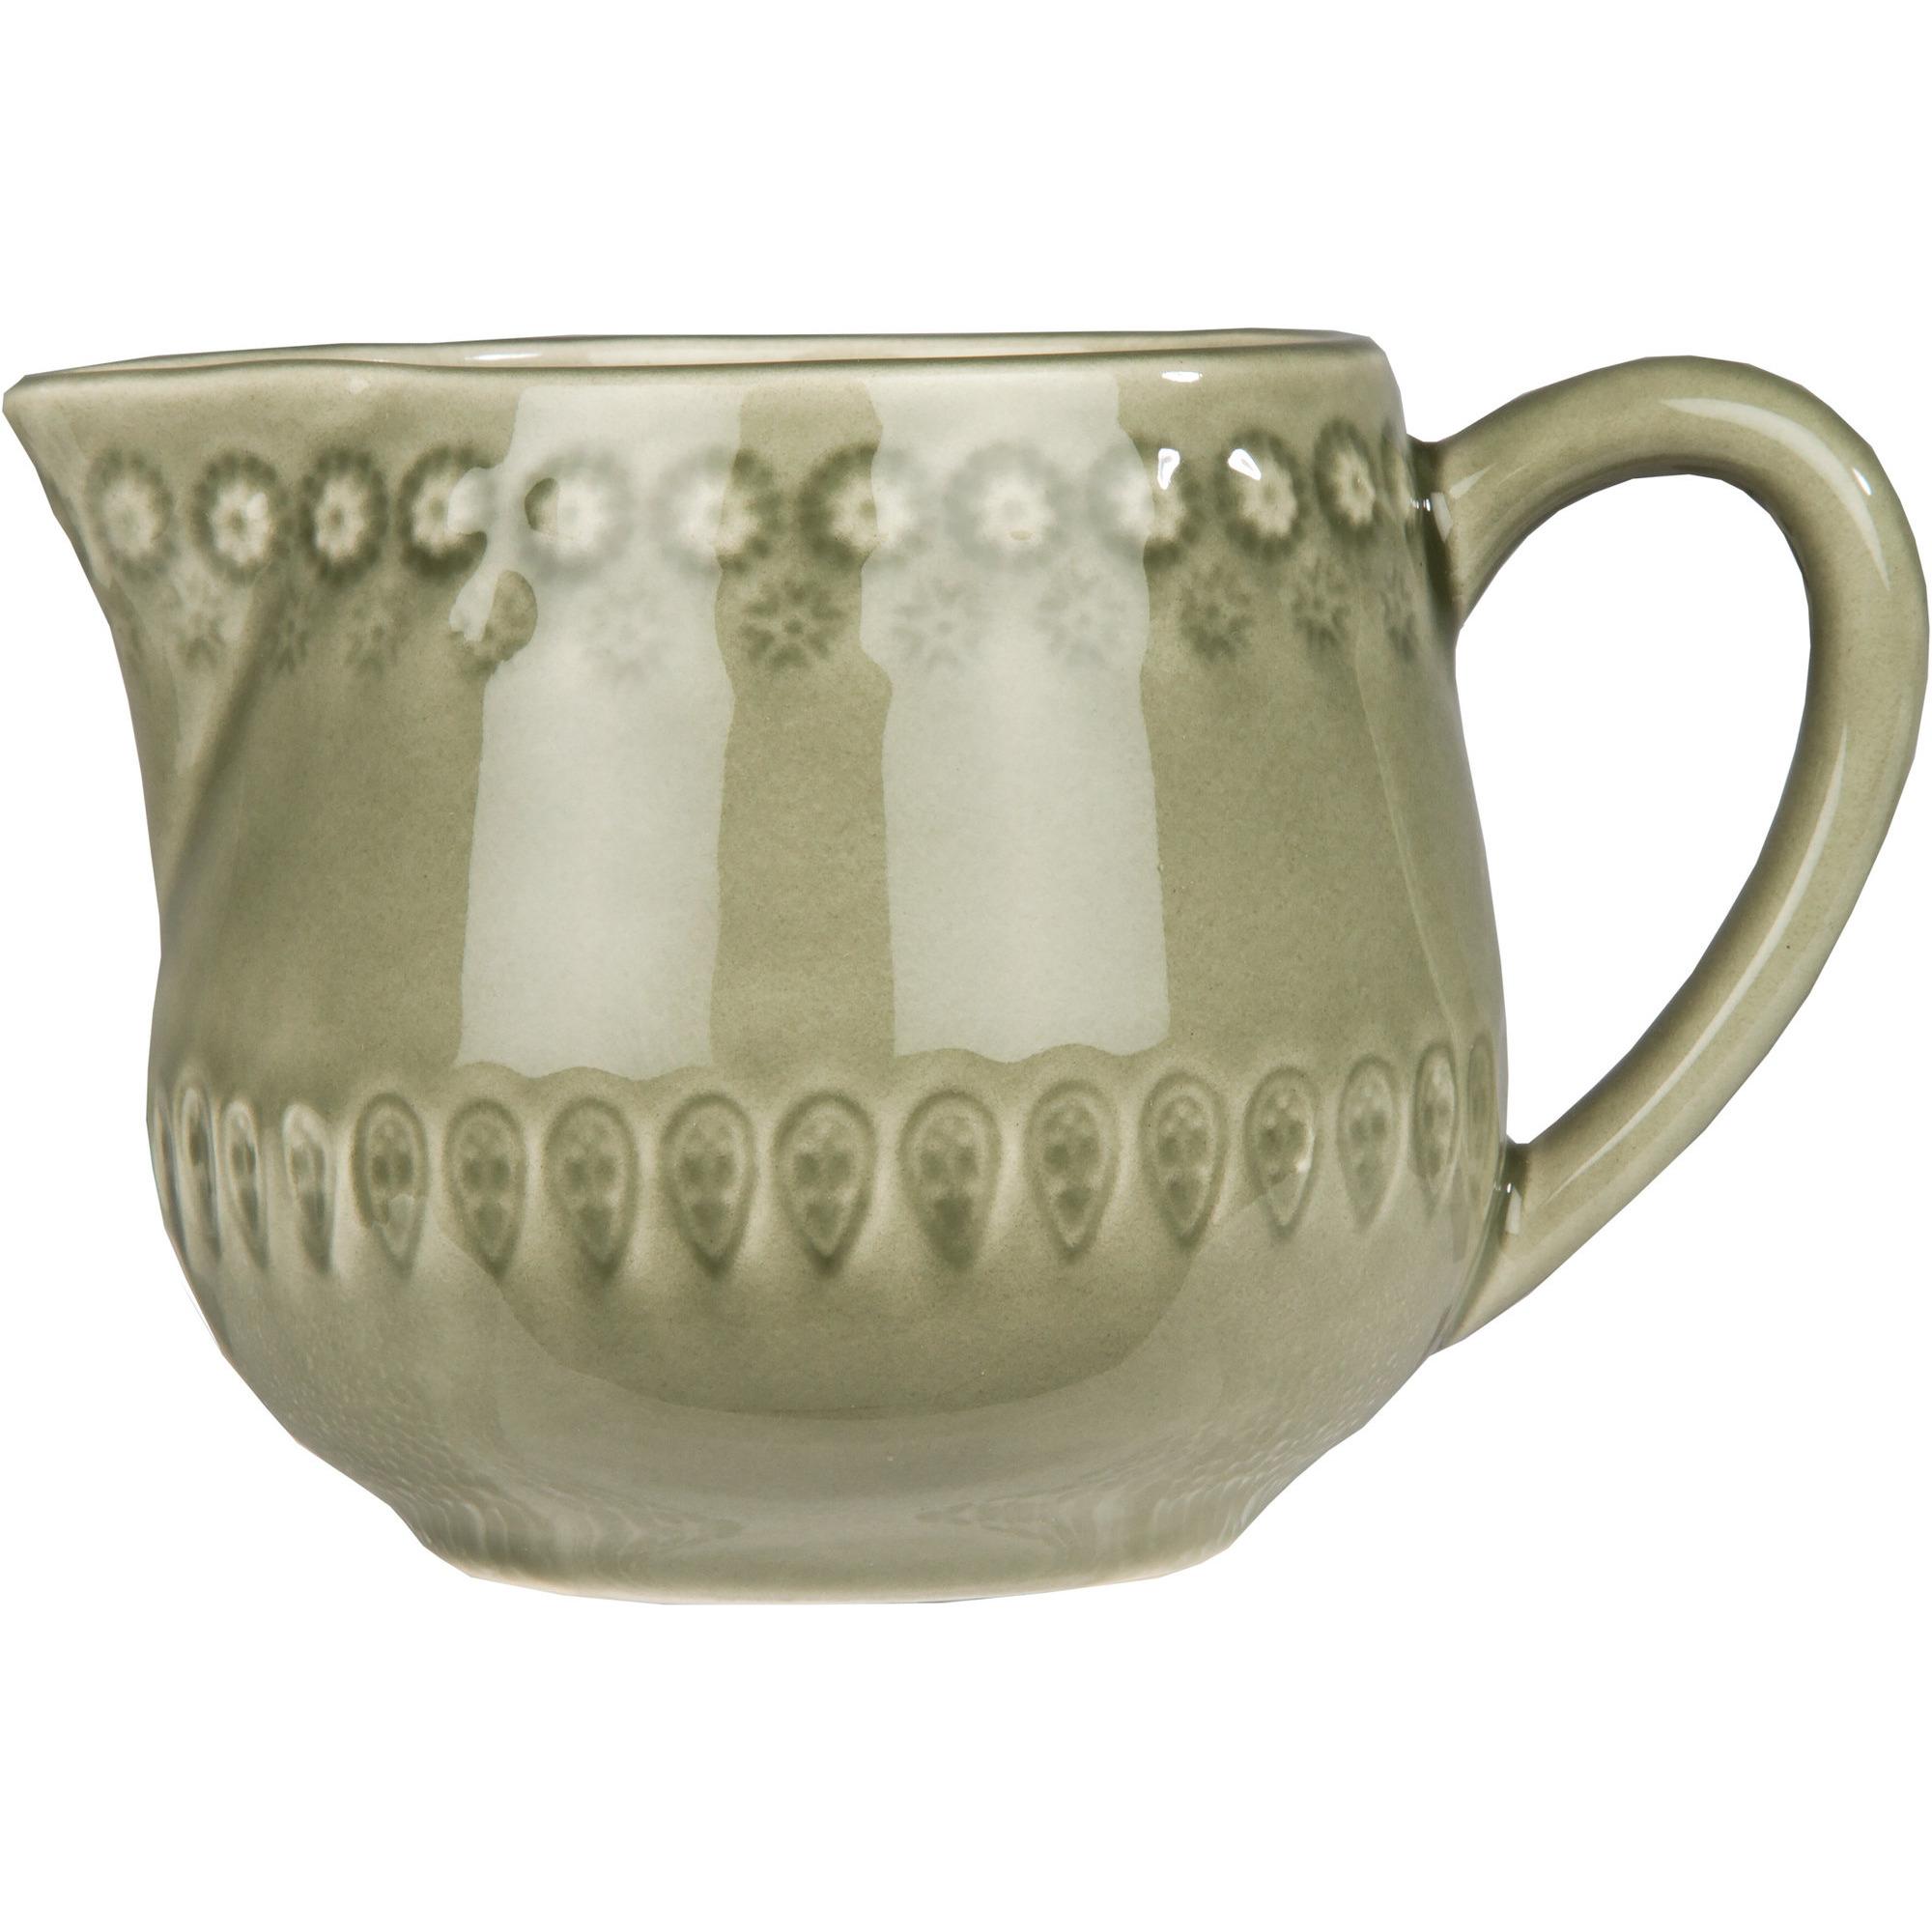 PotteryJo Daisy Mjölkkanna 30 cl Faded Army